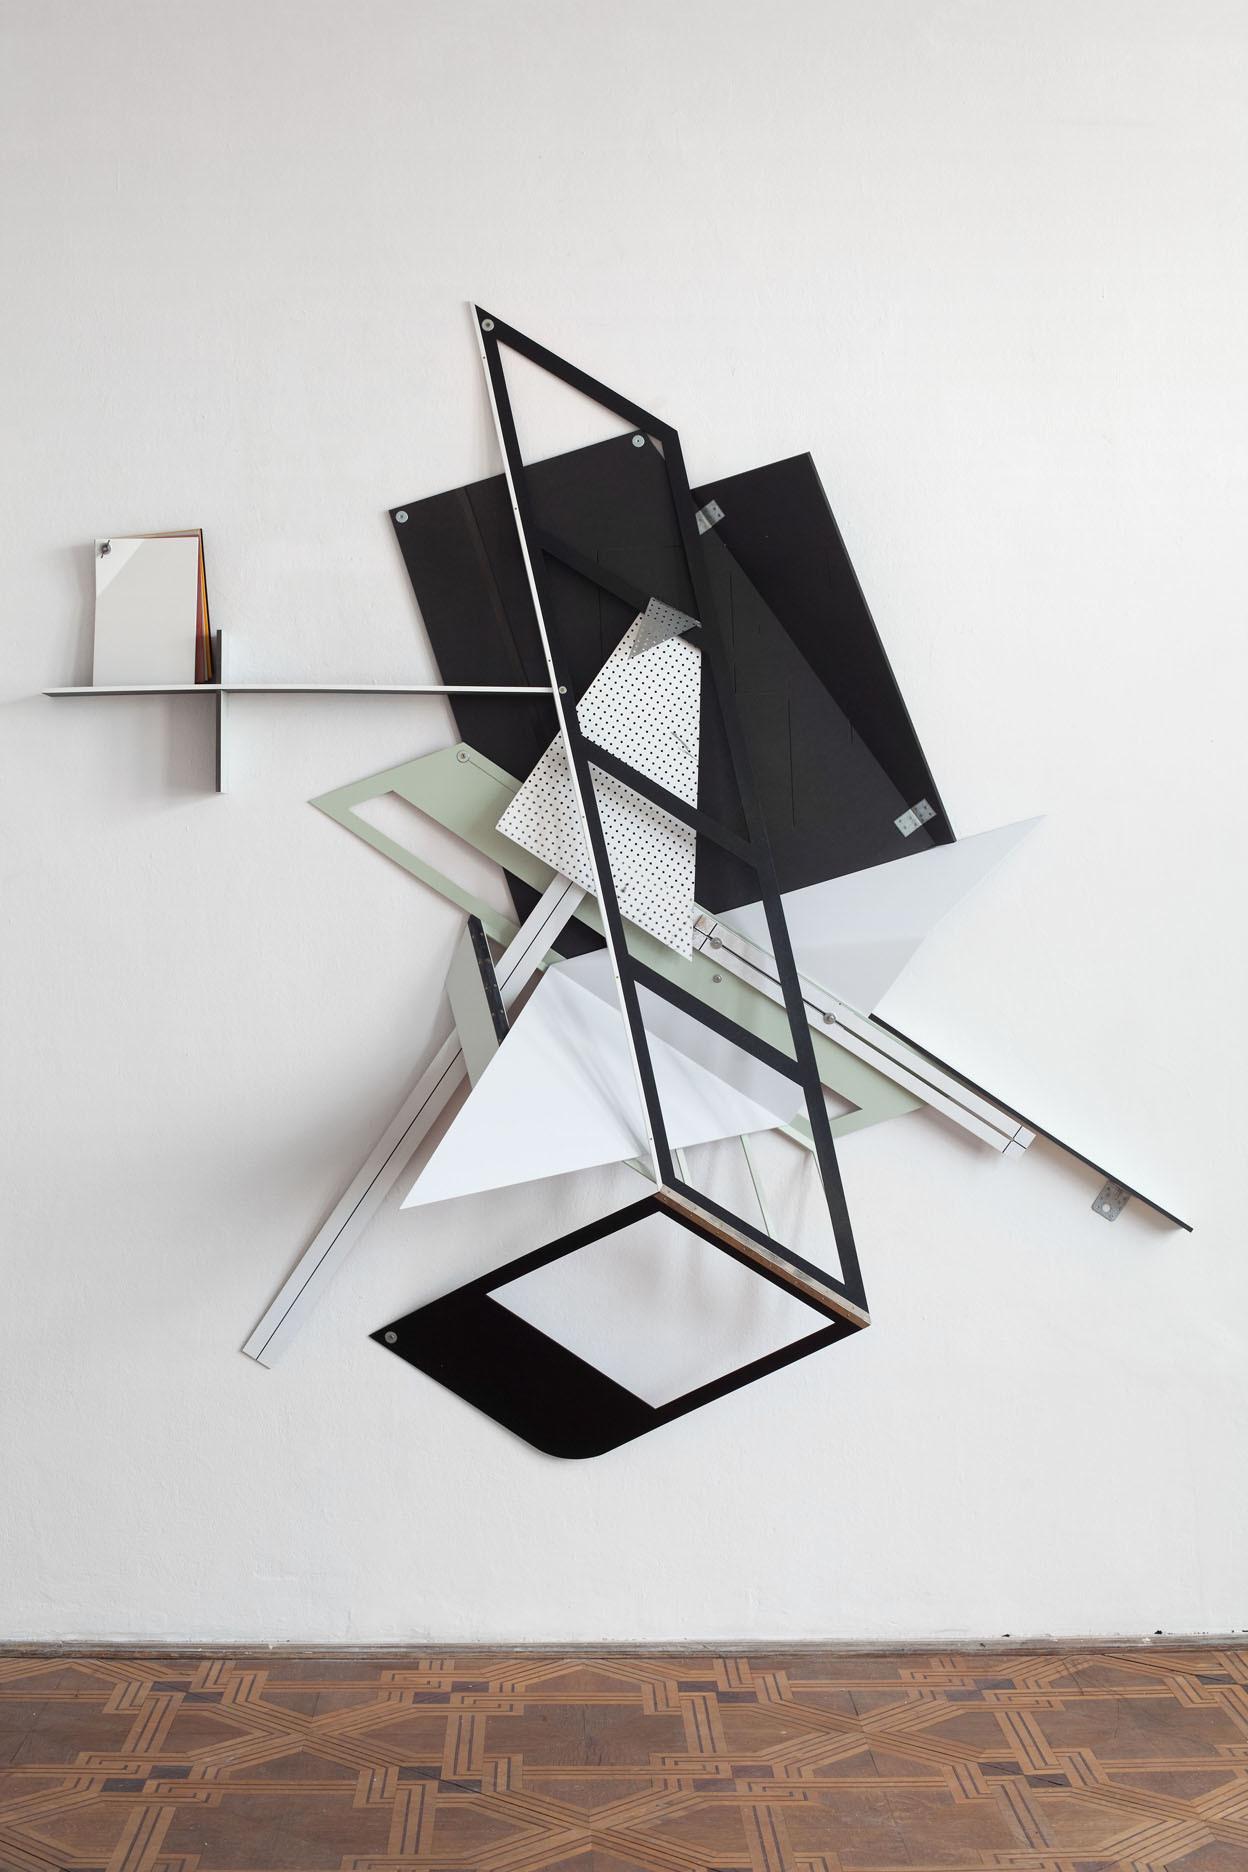 Benjamin Bronni, MT-23/76-13E, 2013, MDF, metal, lakier, 230 x 230 x 50 cm